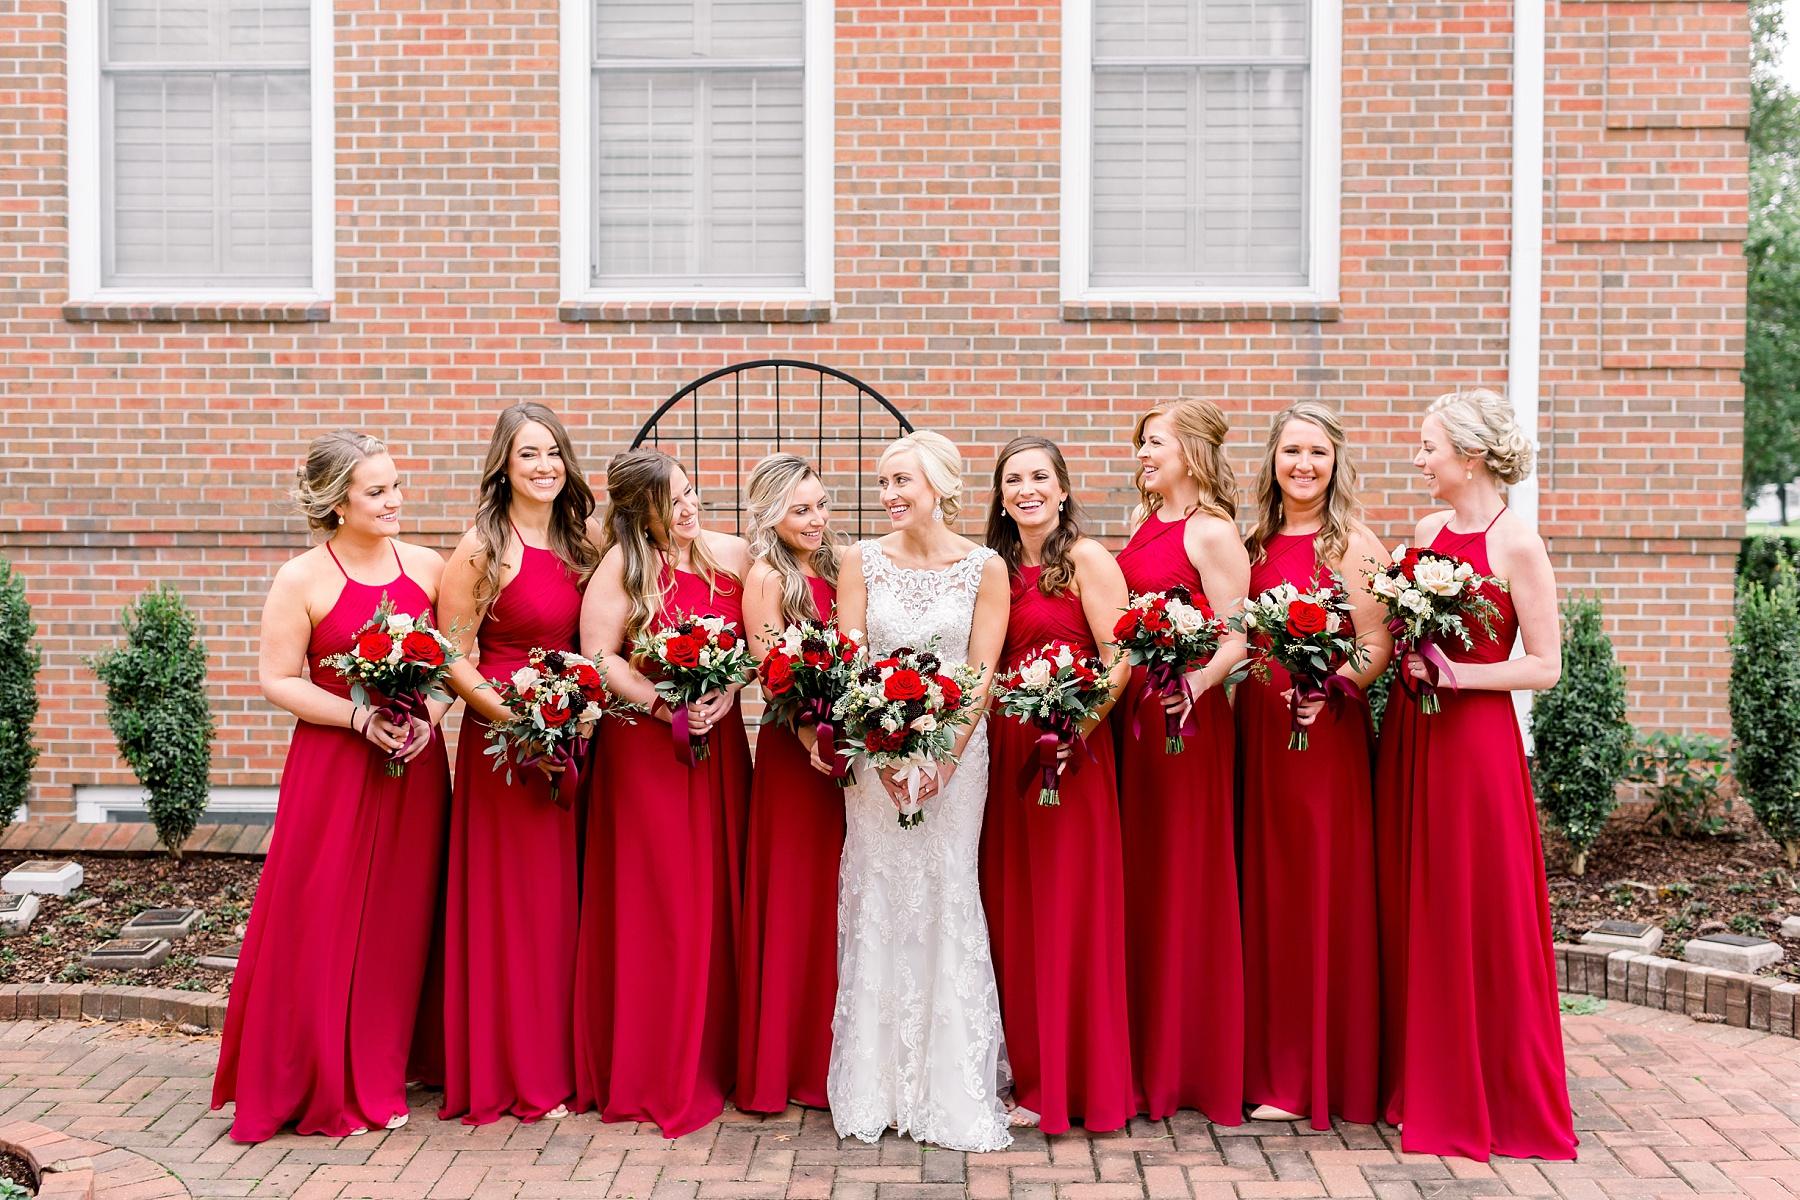 midwest-adventurous-wedding-photographer-elizabeth-ladean-photography-photo_4819.jpg